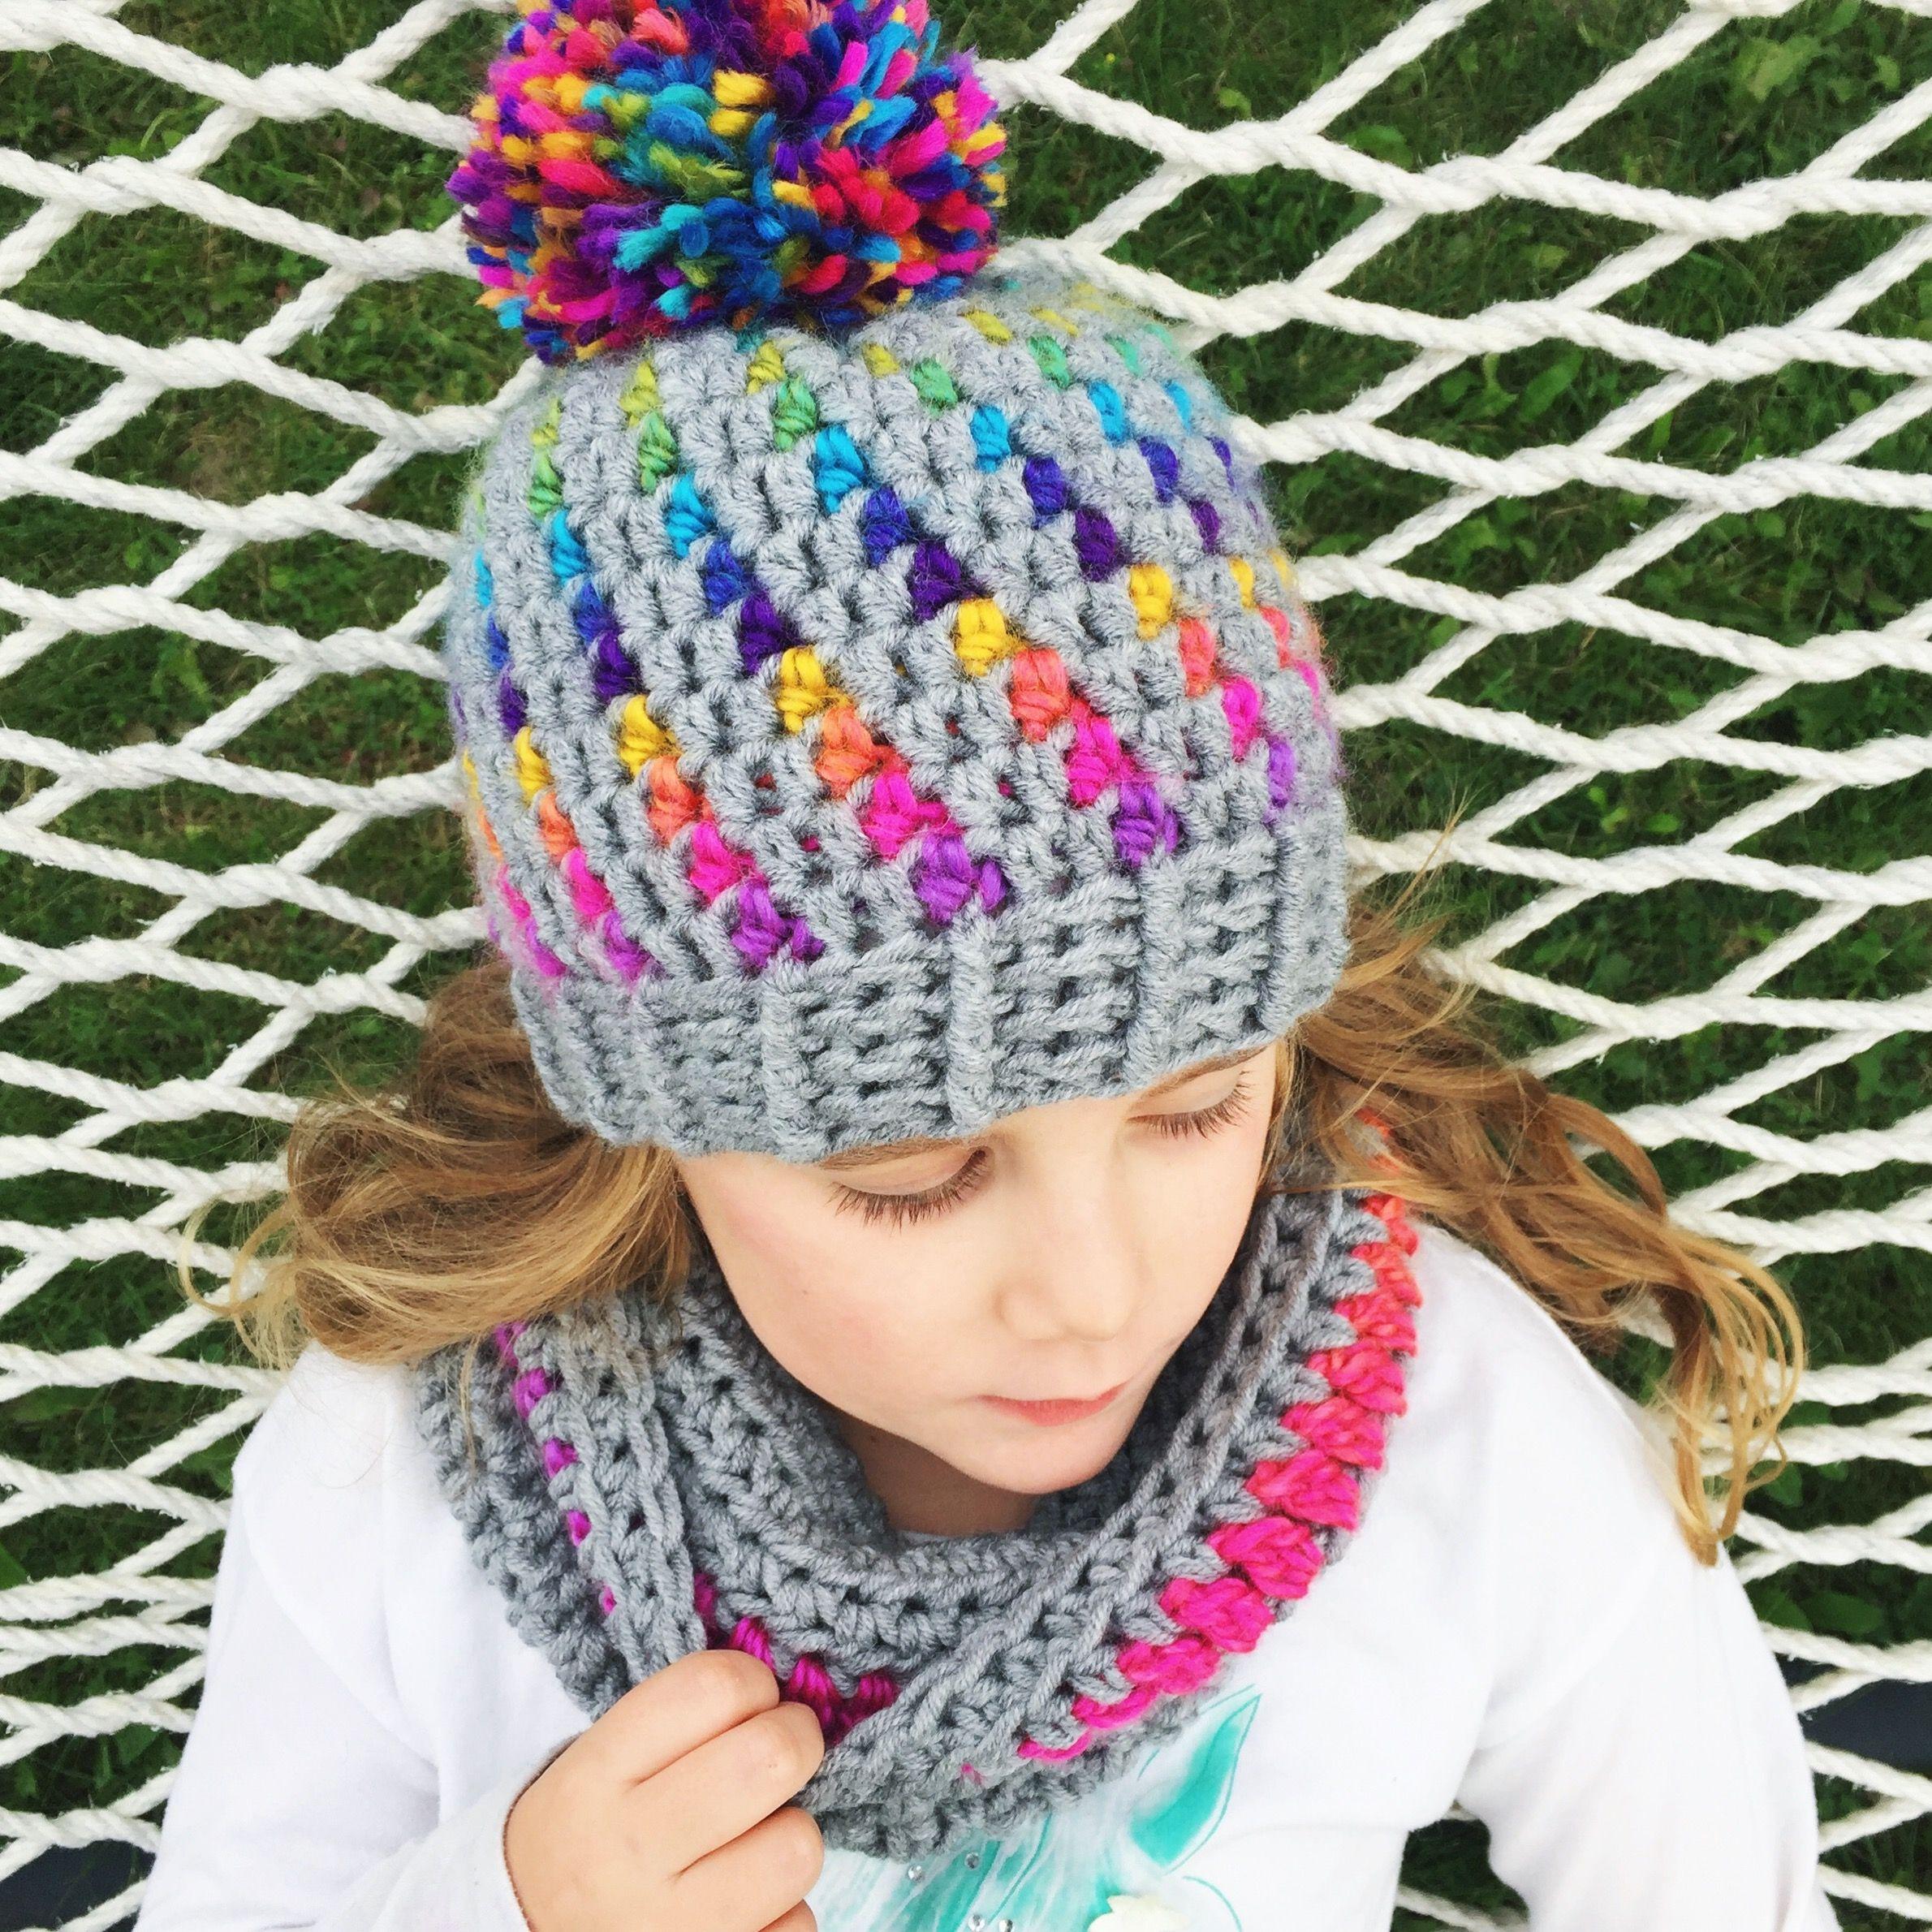 72248858c Crochet Hat Pattern - Northern Lights Pom Pom Hat Crochet Pattern ...